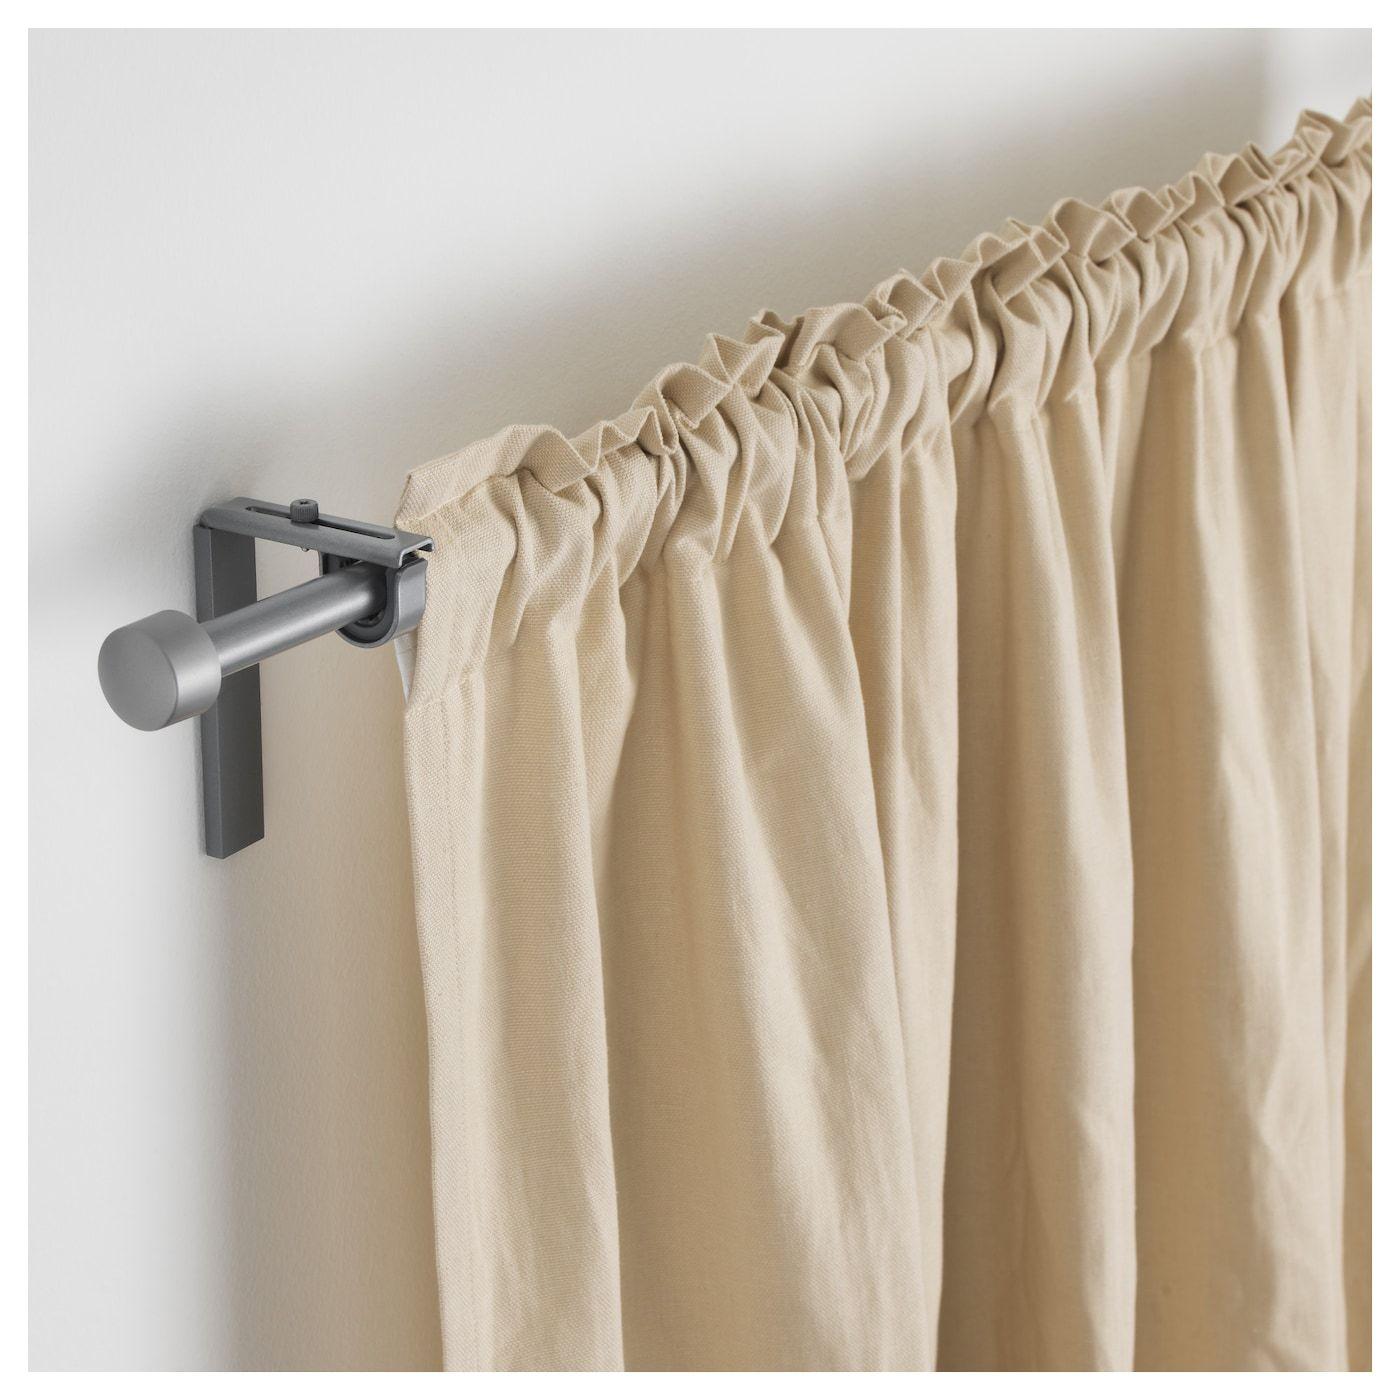 Racka Curtain Rod Combination Silver Color 47 1 4 82 5 8